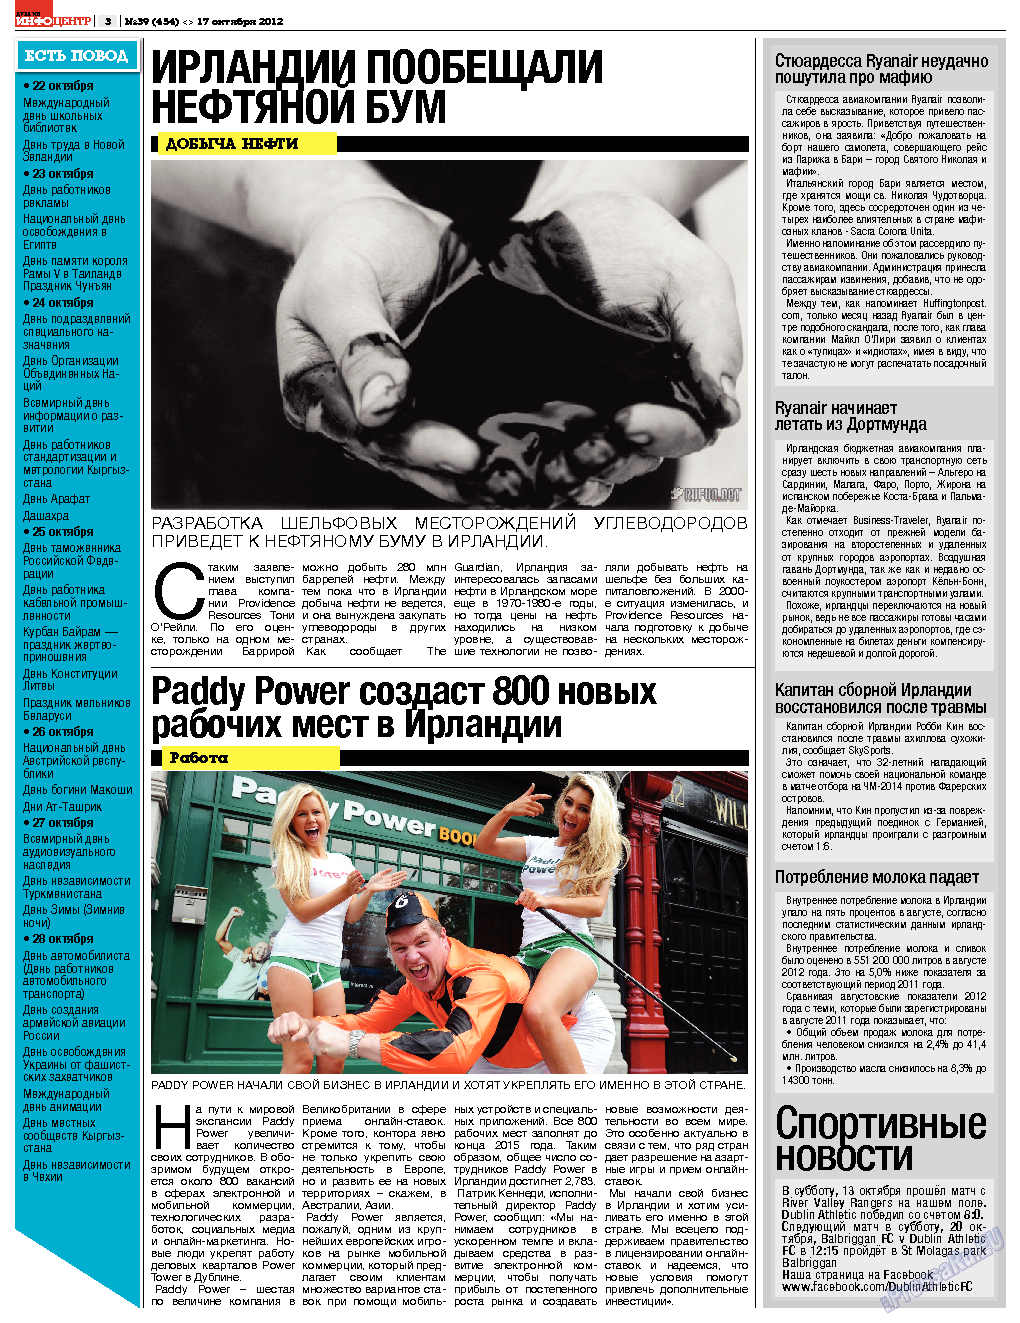 Дублин инфоцентр (газета). 2012 год, номер 38, стр. 3